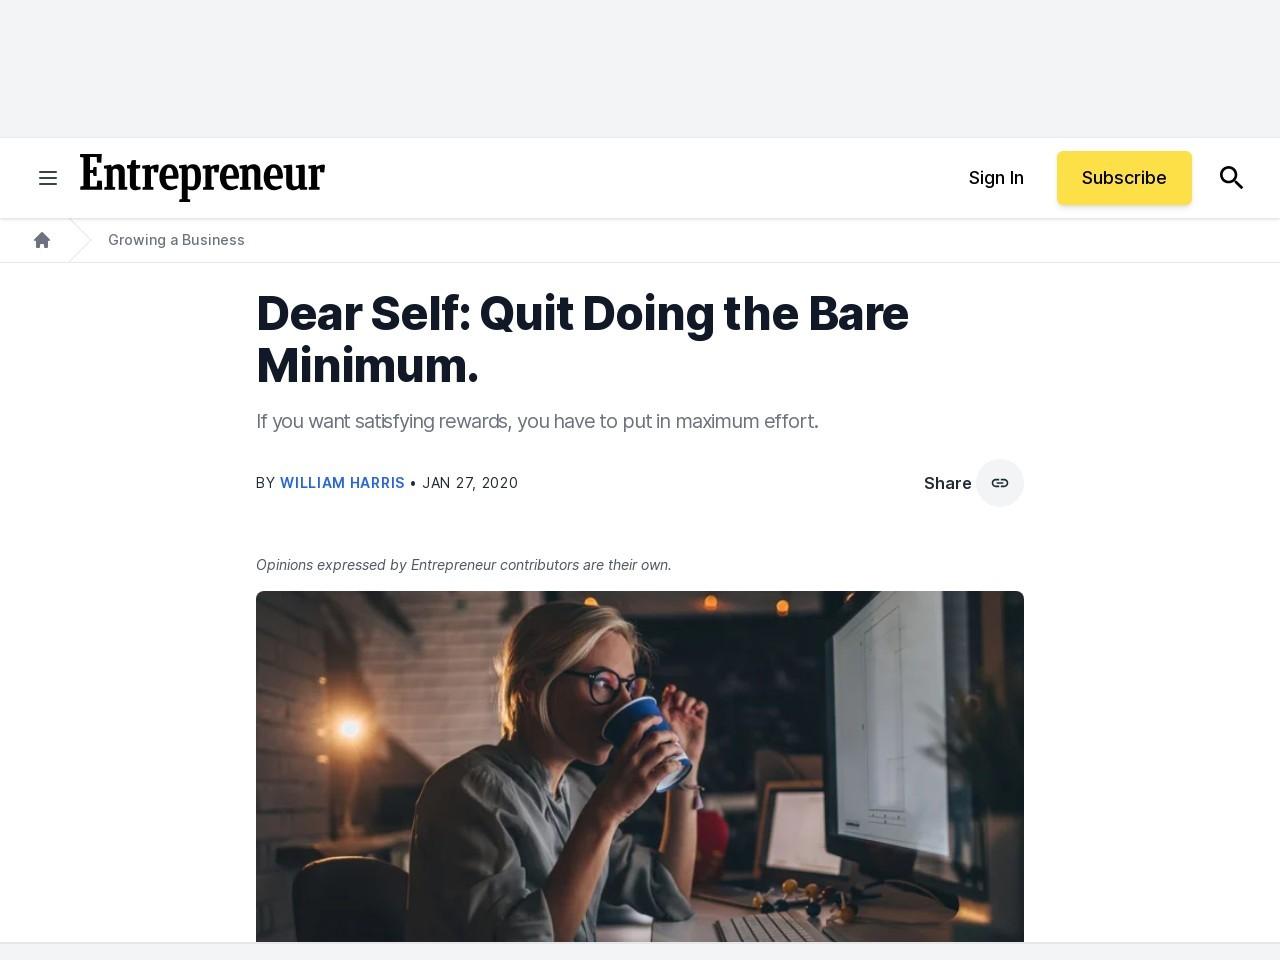 Dear Self: Quit Doing the Bare Minimum.